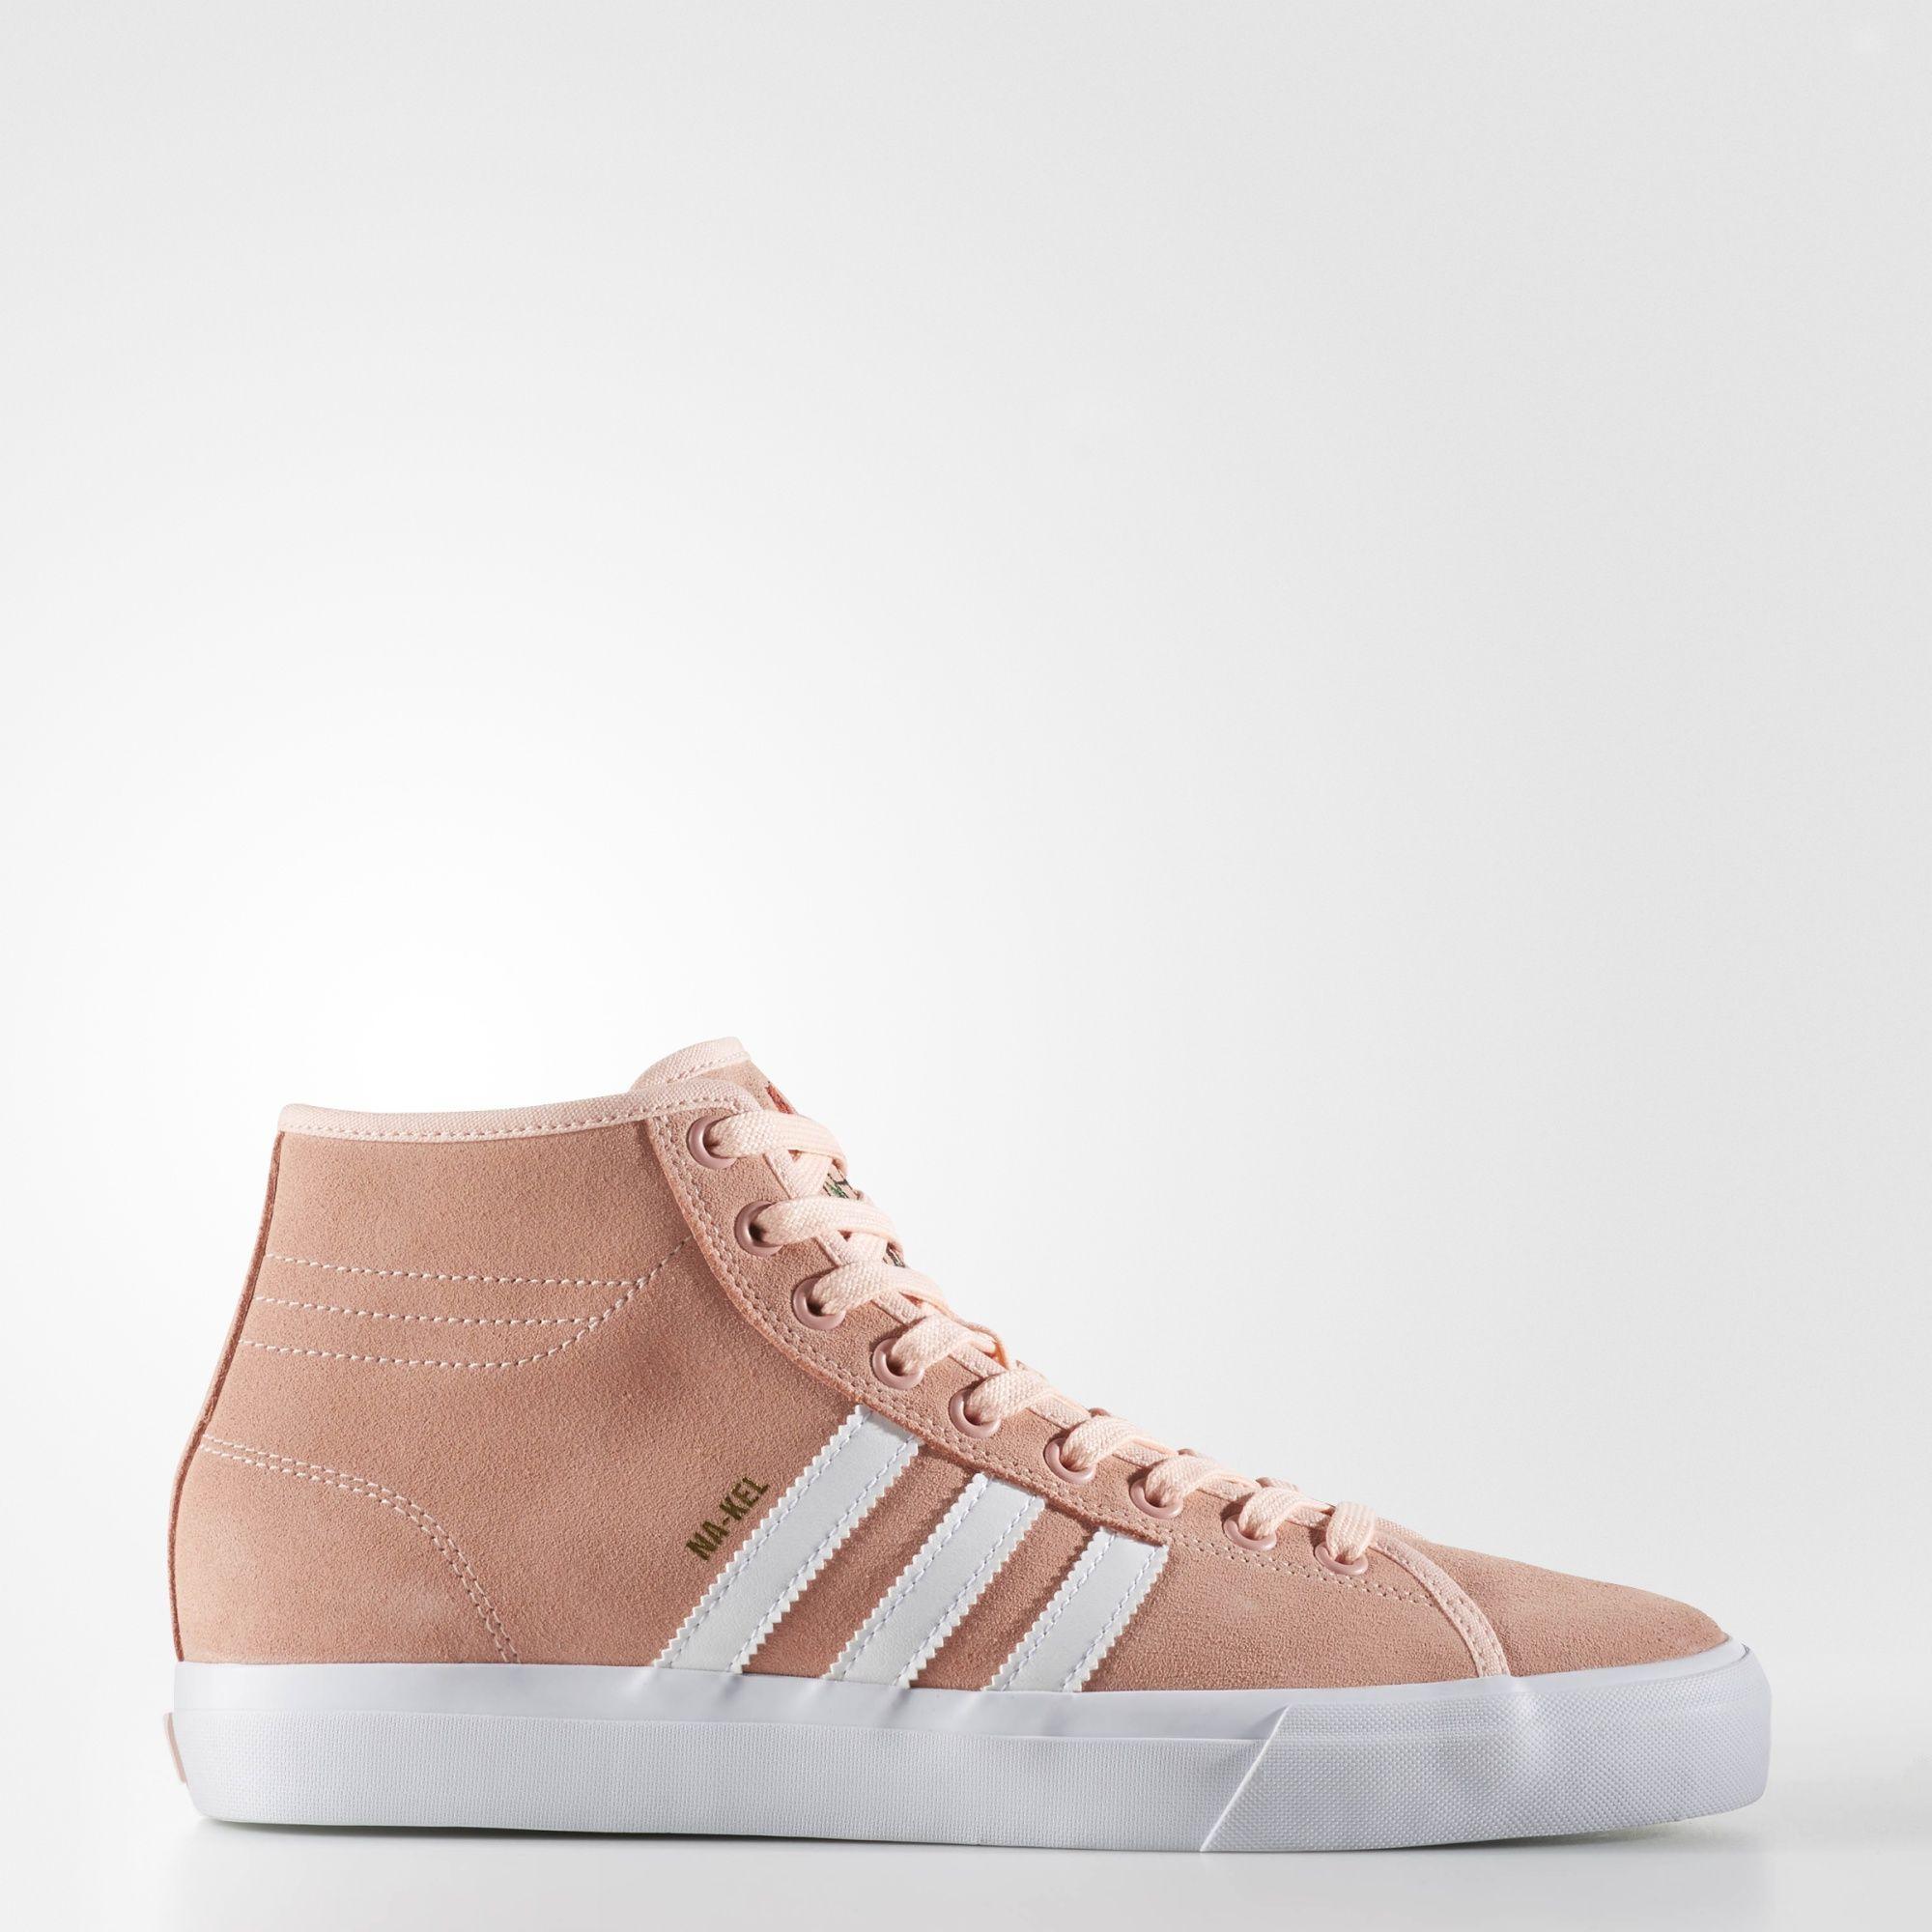 sports shoes a460f b3e74 adidas - Matchcourt Mid Remix Shoes - HAZE CORRAL - SZ 10